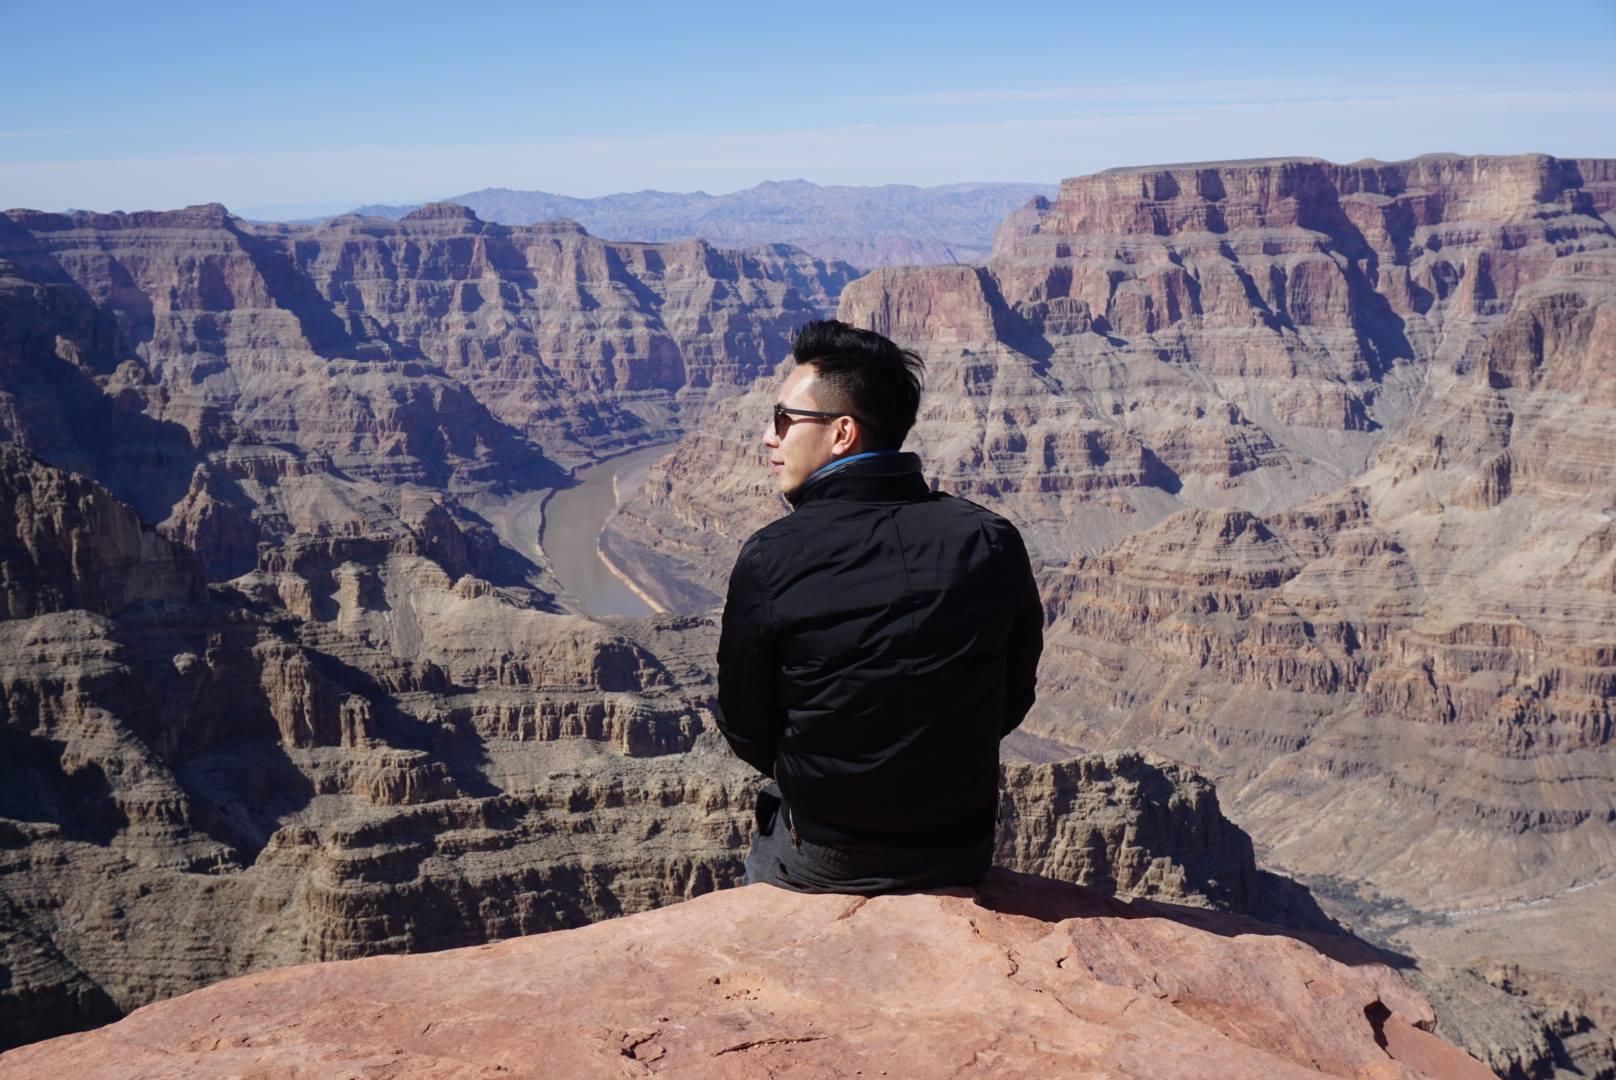 12 Edward在科罗拉多大峡谷.jpg